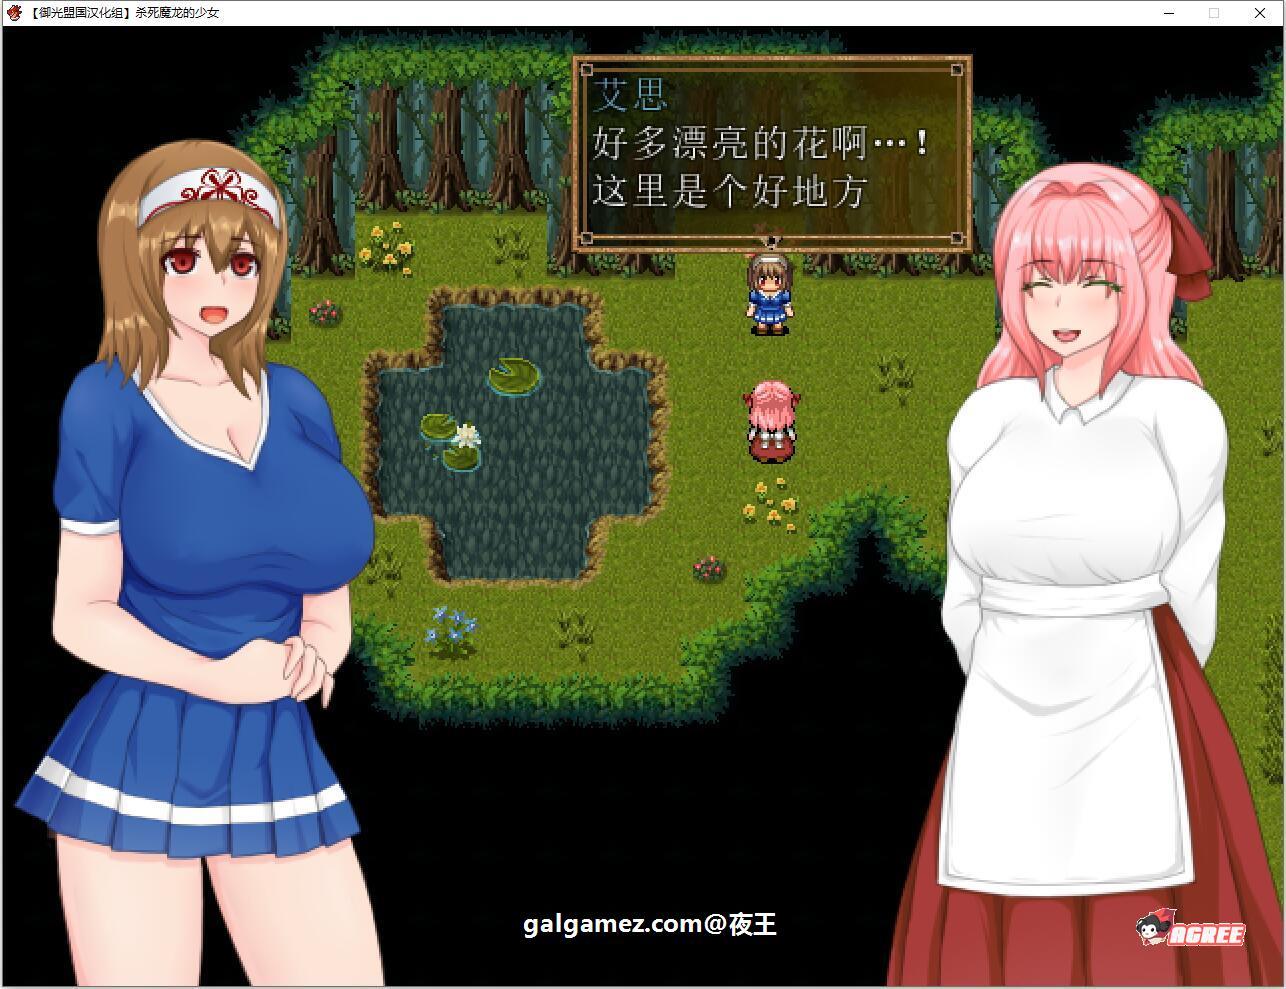 【RPG/汉化】杀死魔龙的少女 精翻汉化完结版+CG【新汉化/全CV/500M】